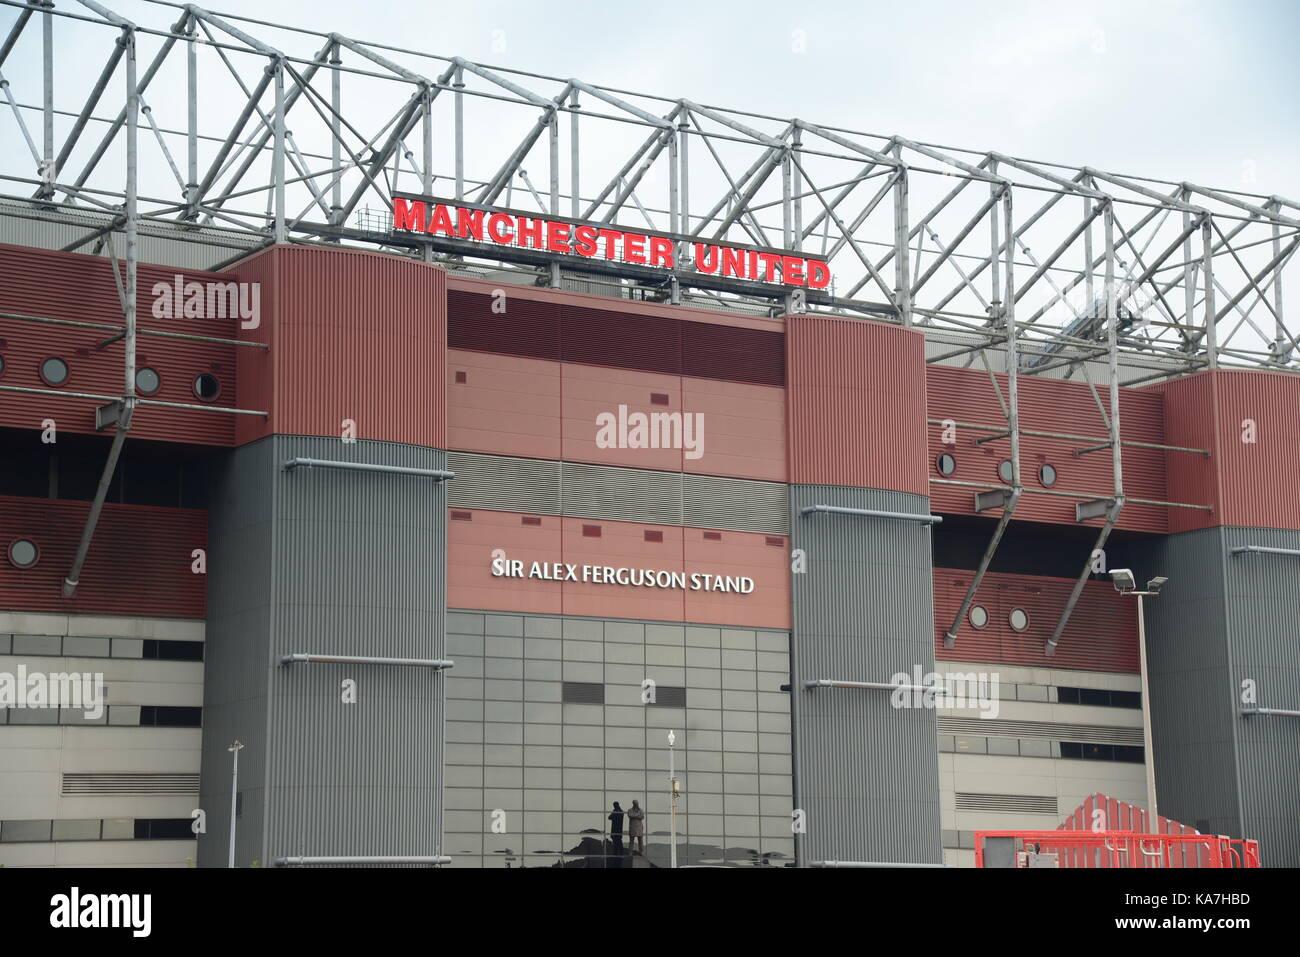 Manchester United - Stock Image